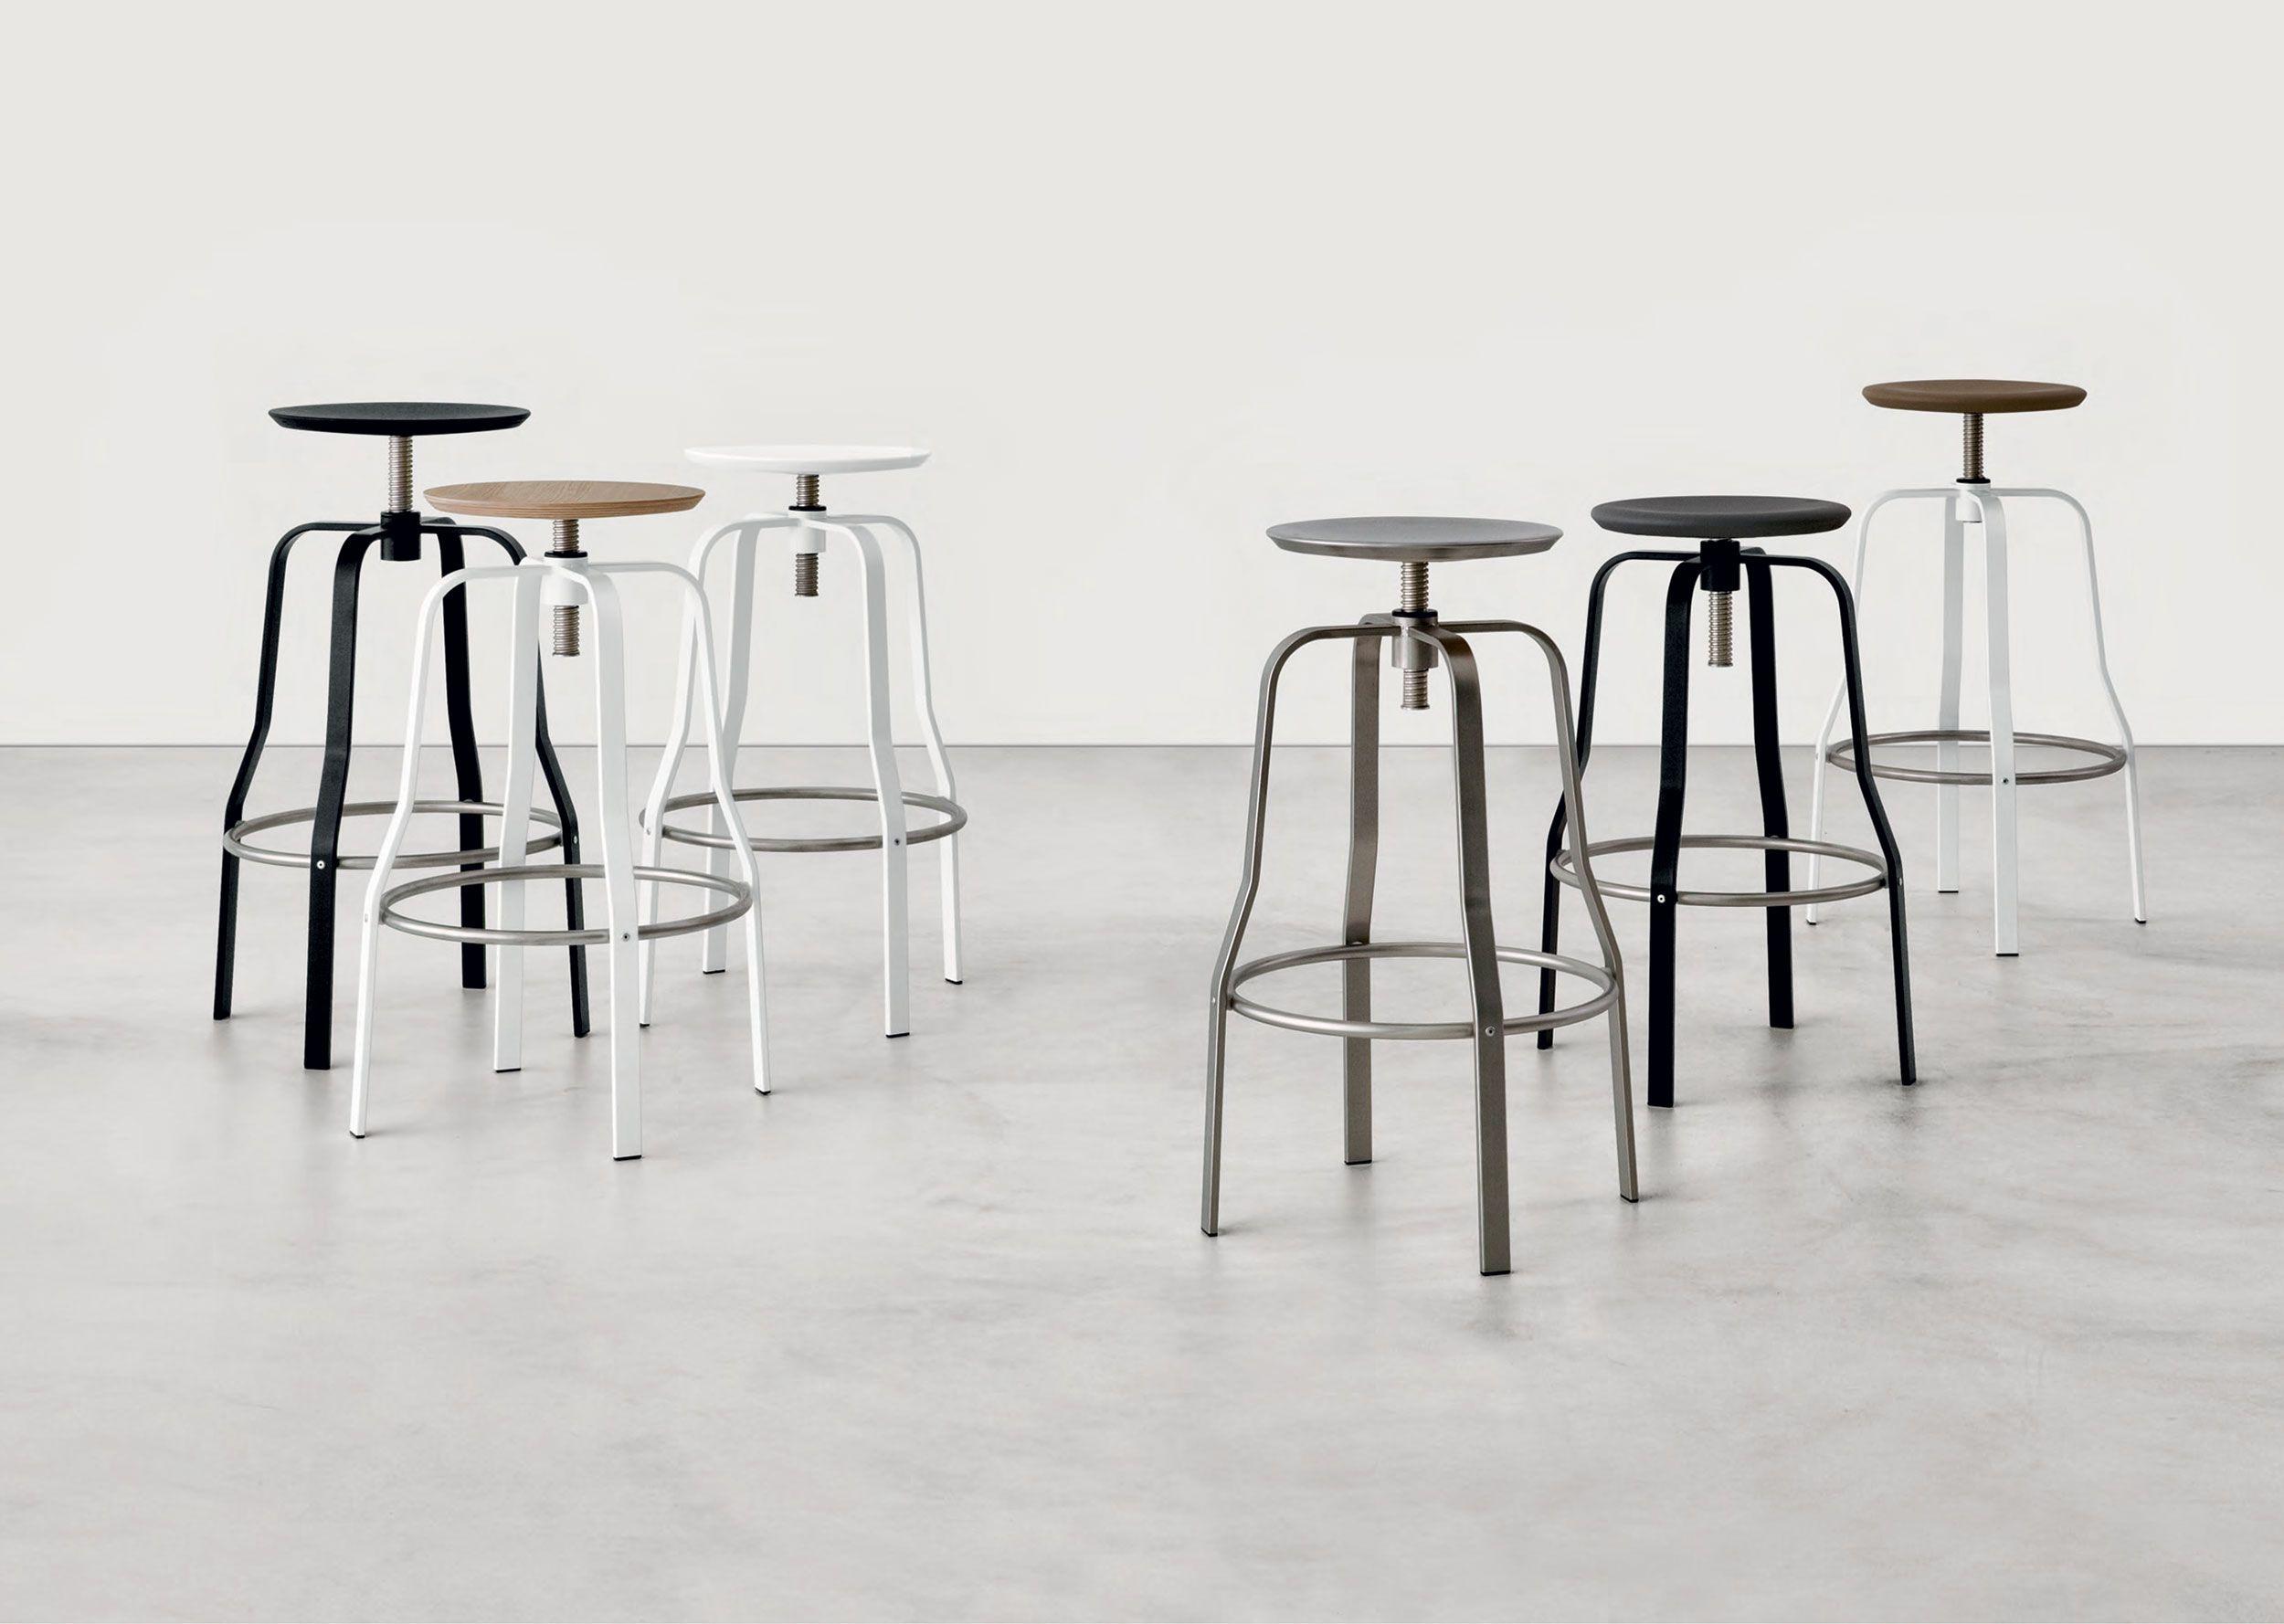 lapalma giro chairs pinterest products chairs and cats contemporary bar stool industrial style giro by fabio bortolani lapalma